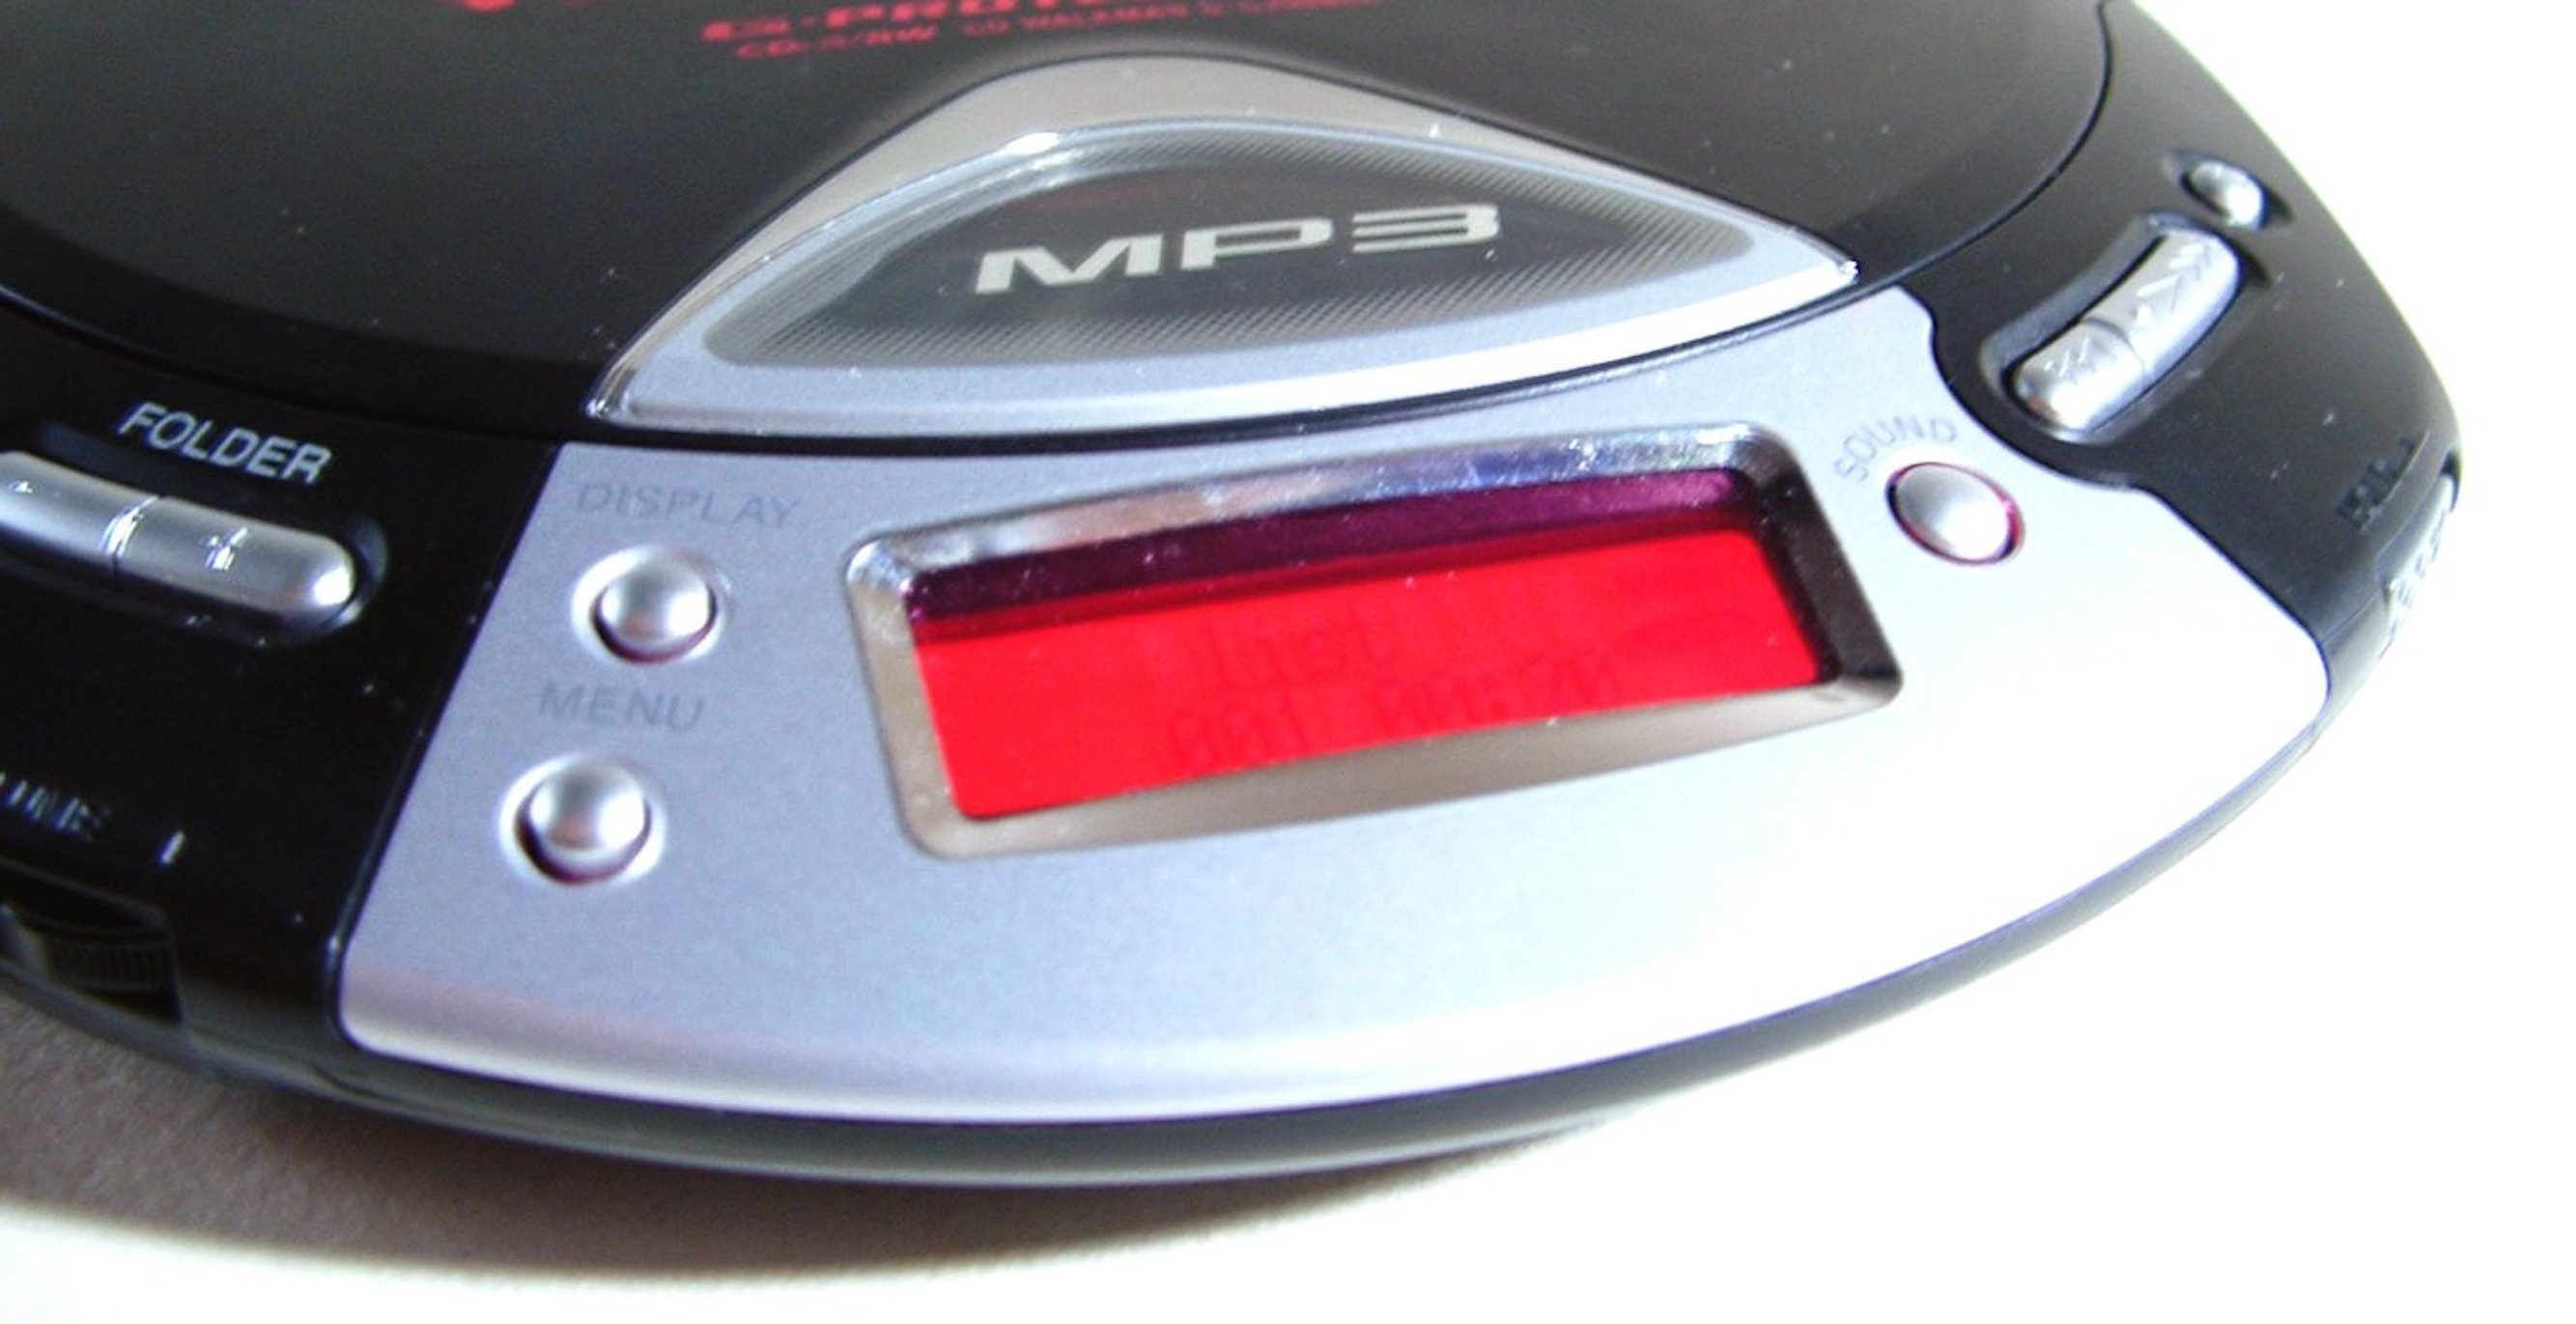 MP3-spelarens historia